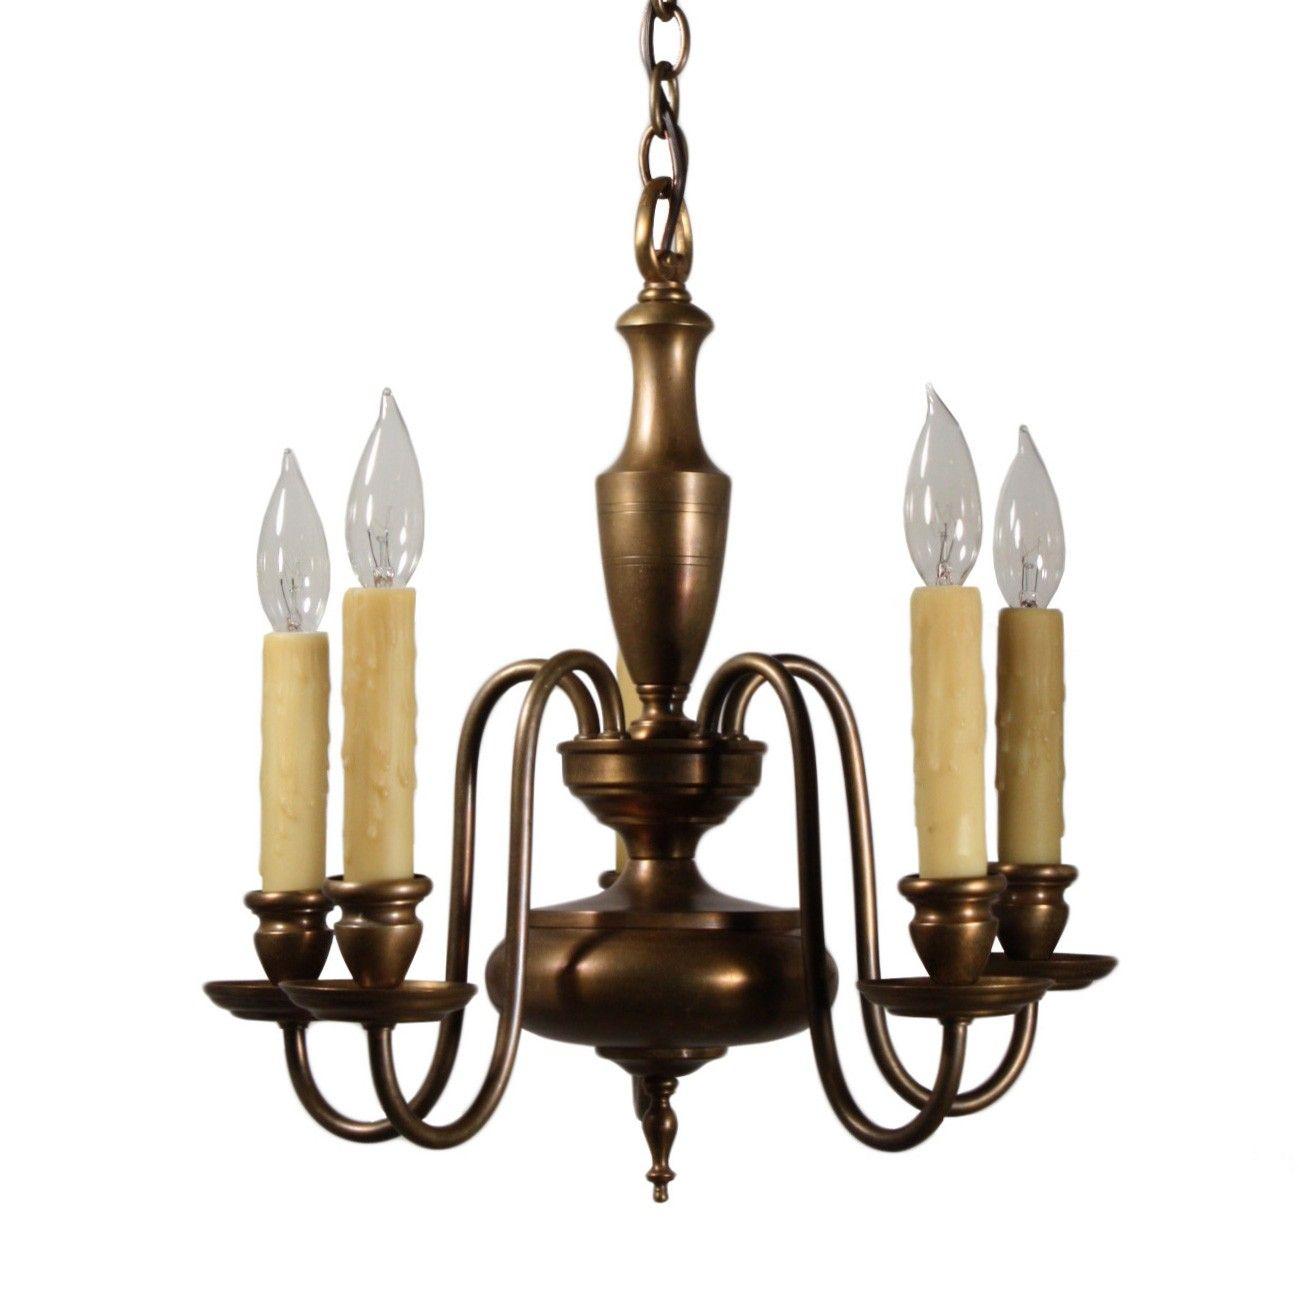 SOLD Beautiful Antique Five-Light Colonial Revival Chandelier Brass  sc 1 st  Pinterest & SOLD Beautiful Antique Five-Light Colonial Revival Chandelier Brass ...